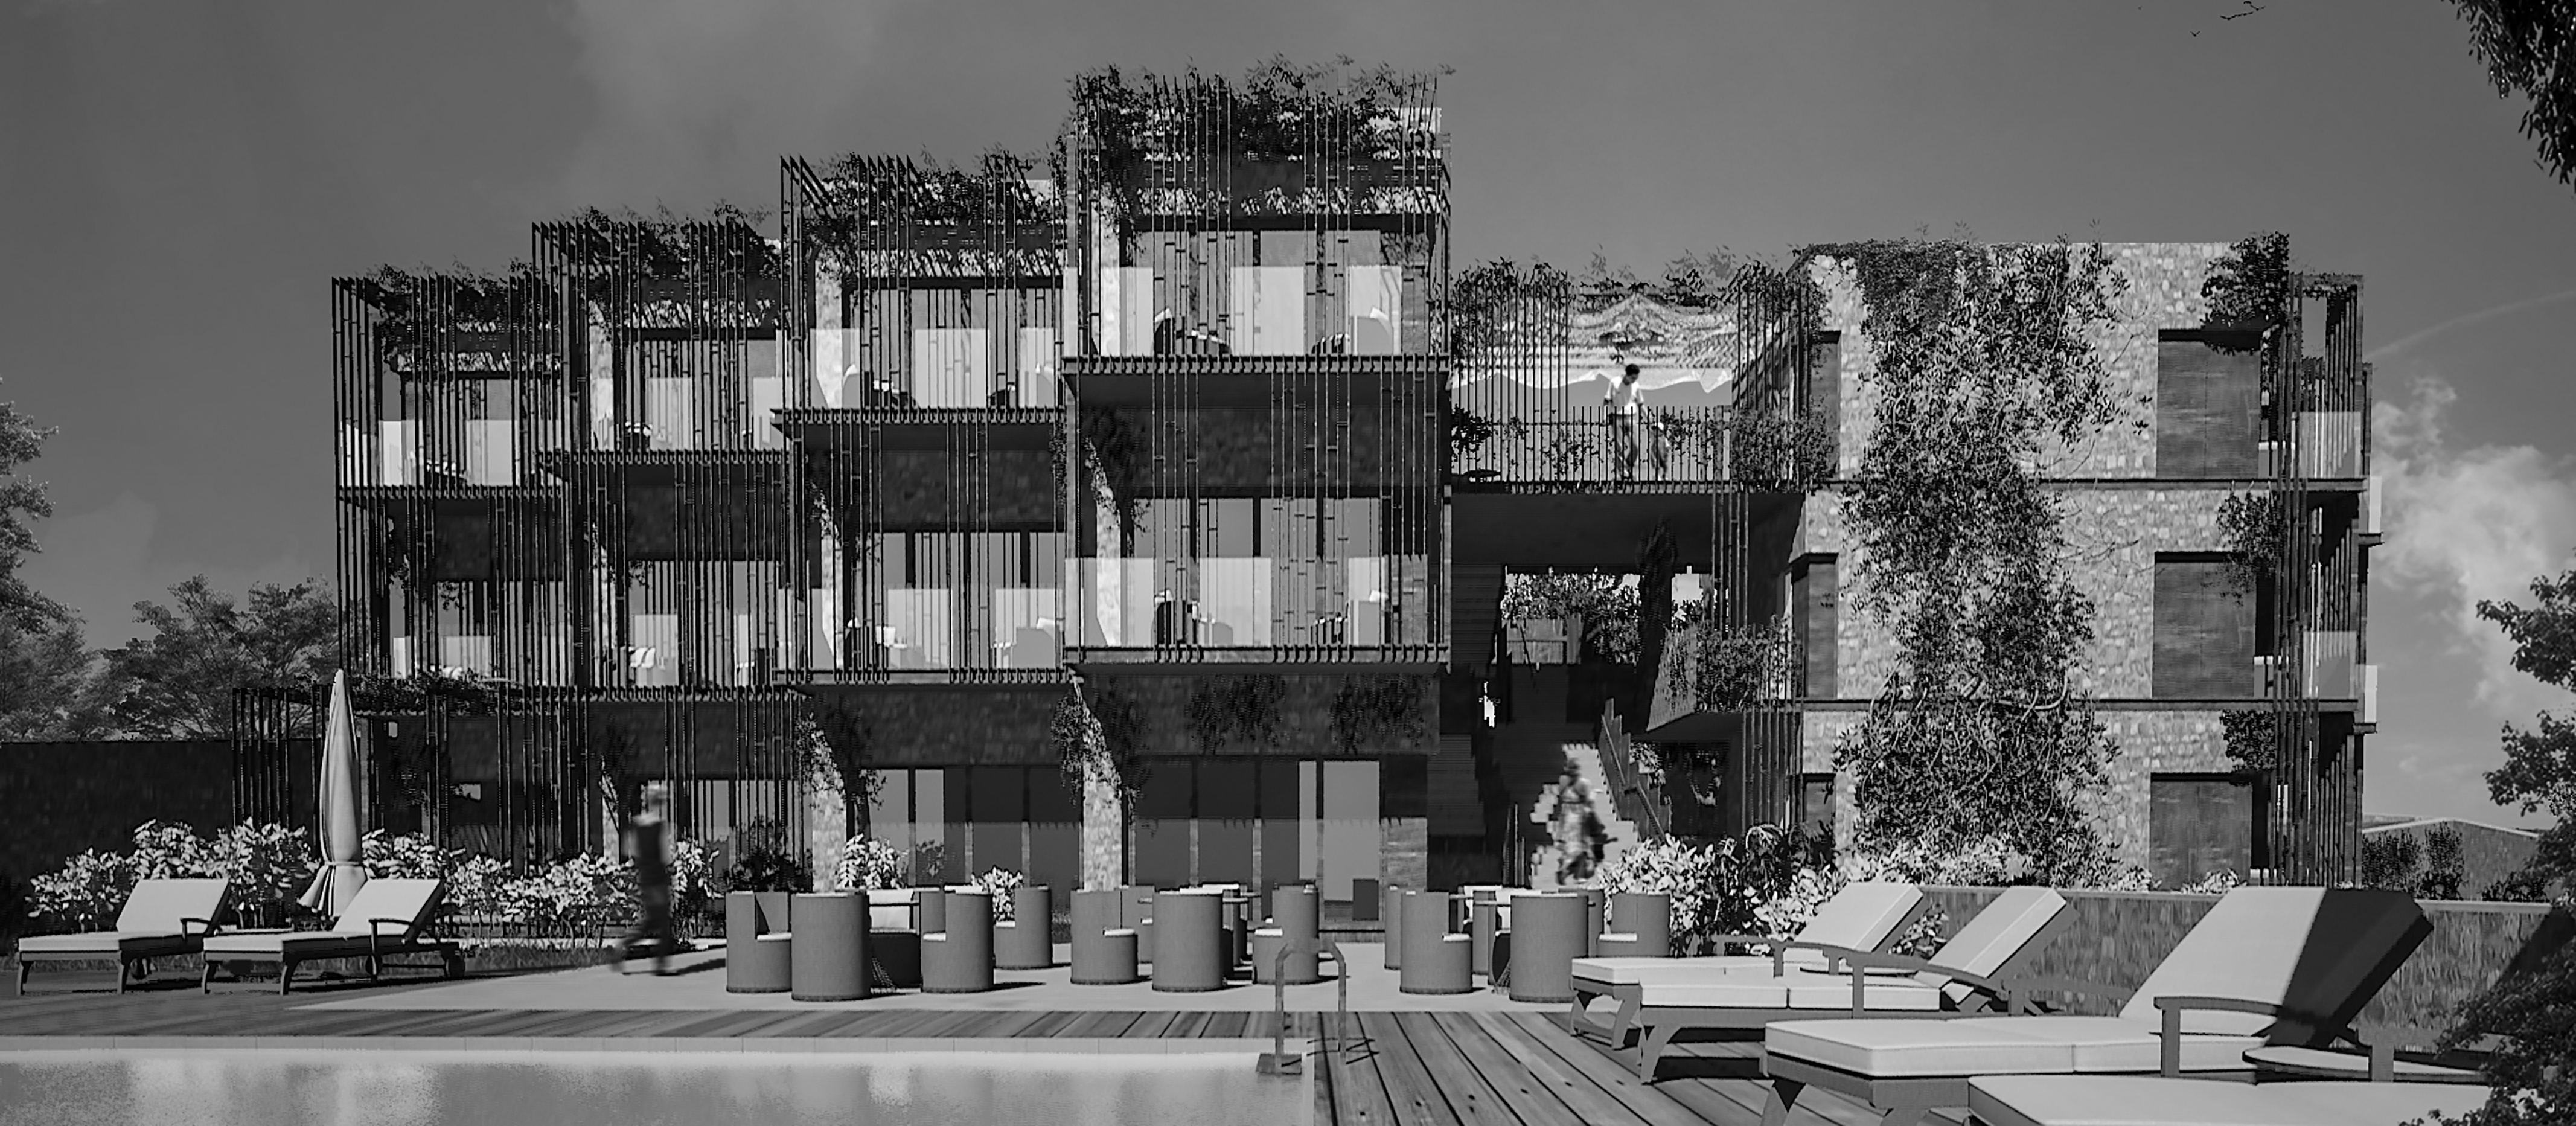 Boutique Hotel Architectural Concept